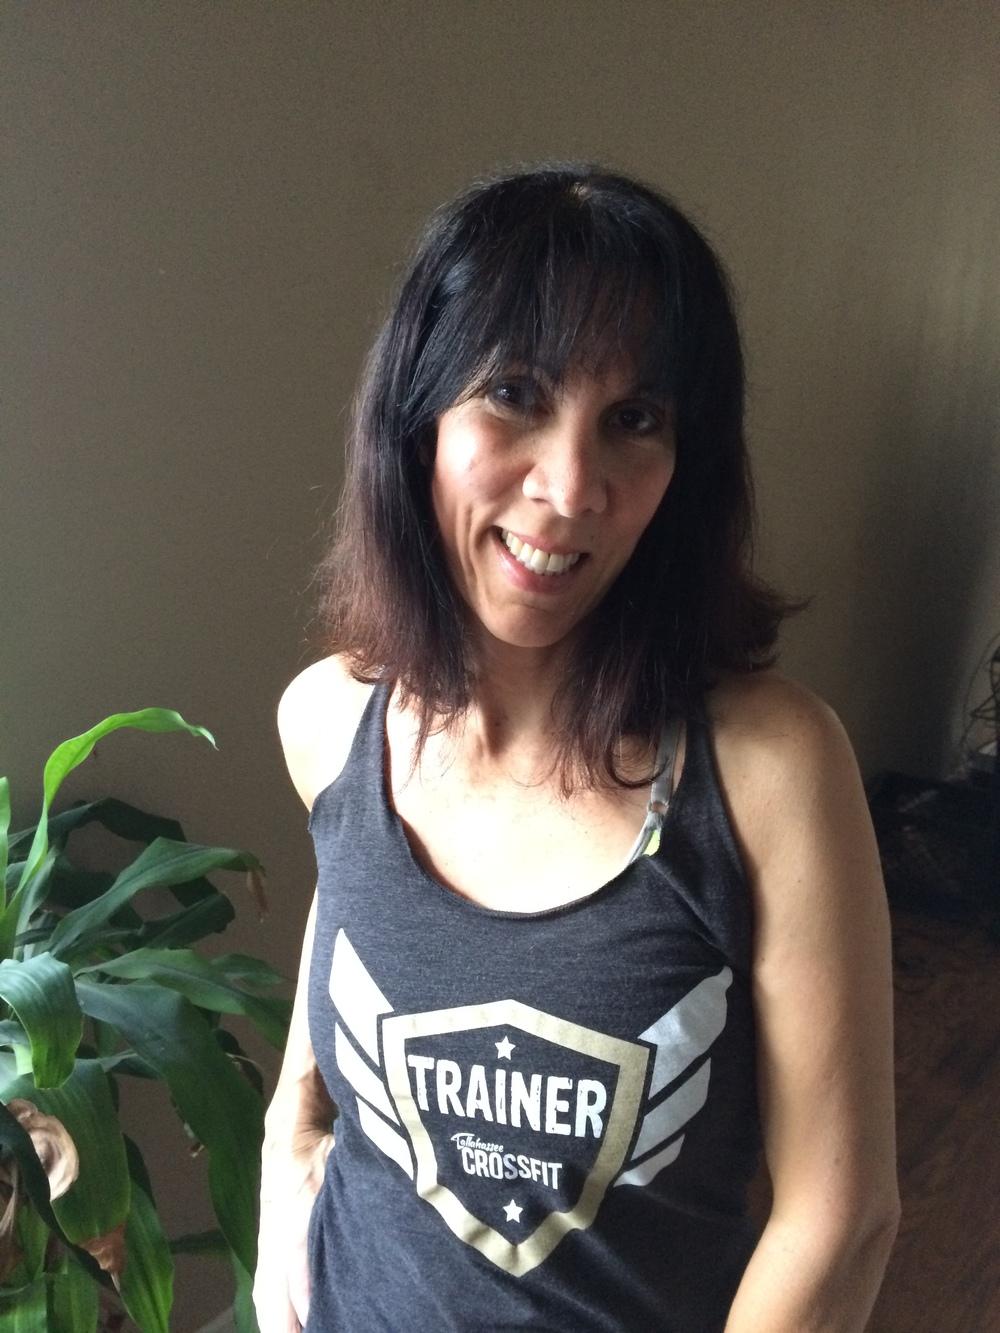 Teresa Keeter - Level 2 CrossFit Trainer & Owner